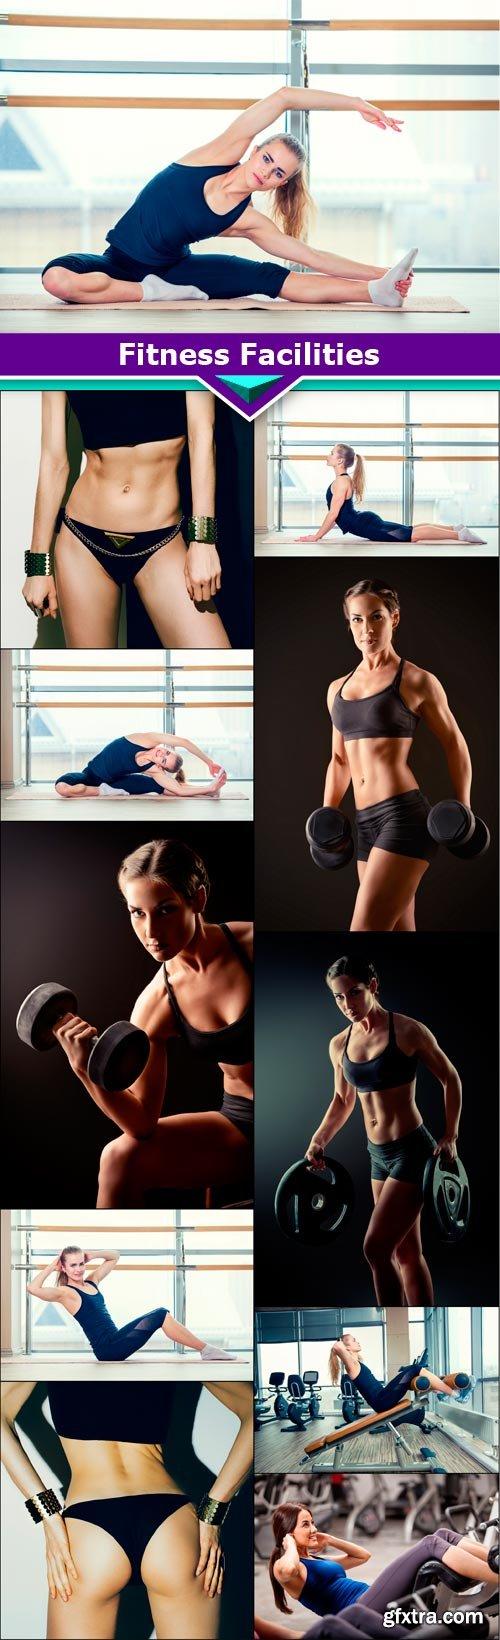 Fitness Facilities 11x PEG